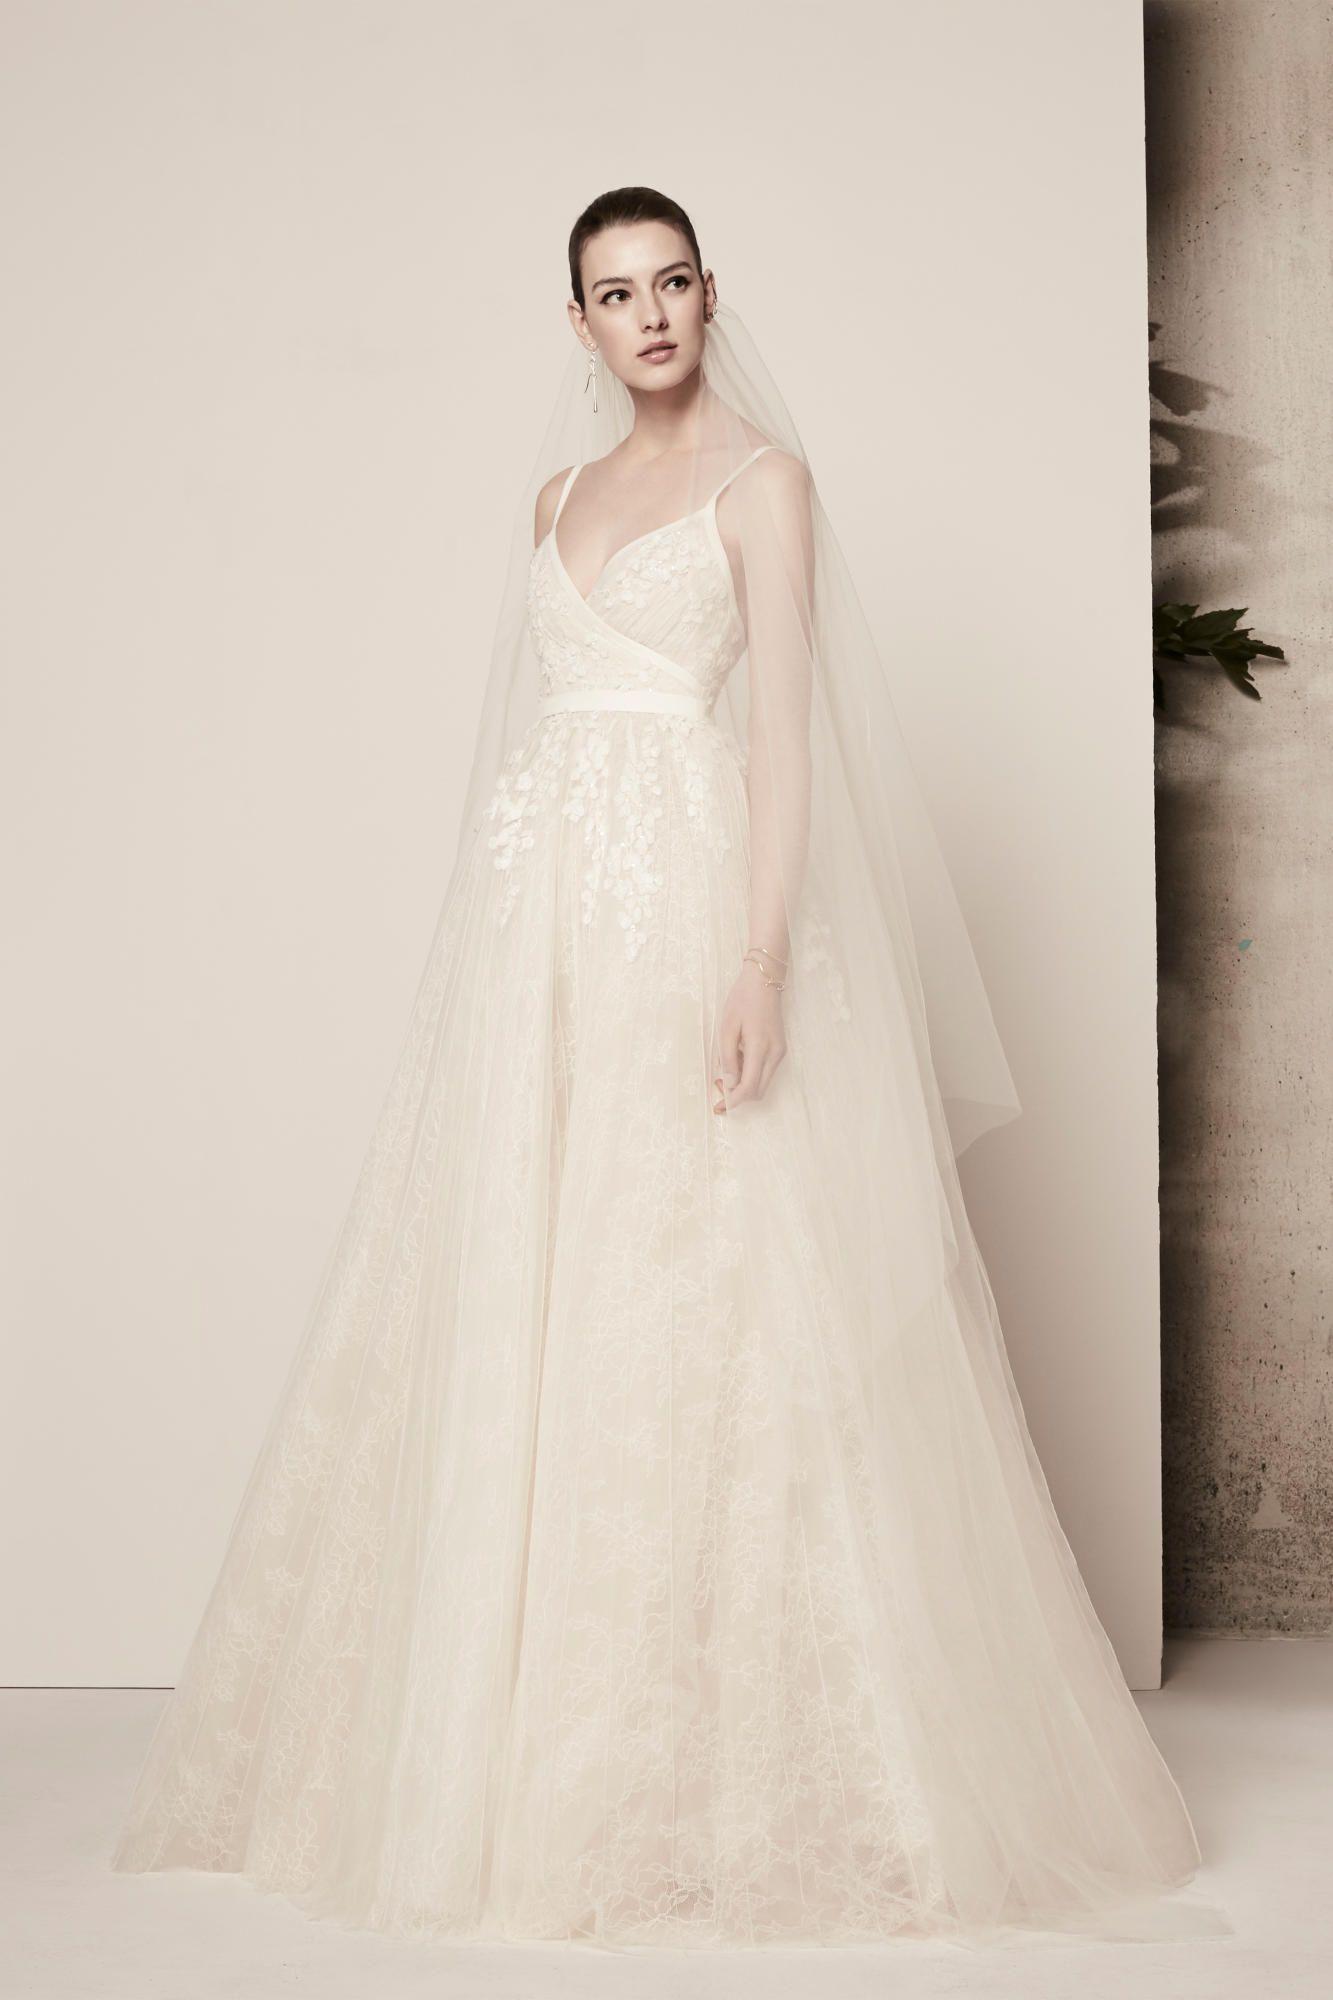 elie-saab-spring-2018-bridal-layers-dress Tendências de vestidos de noiva para 2018